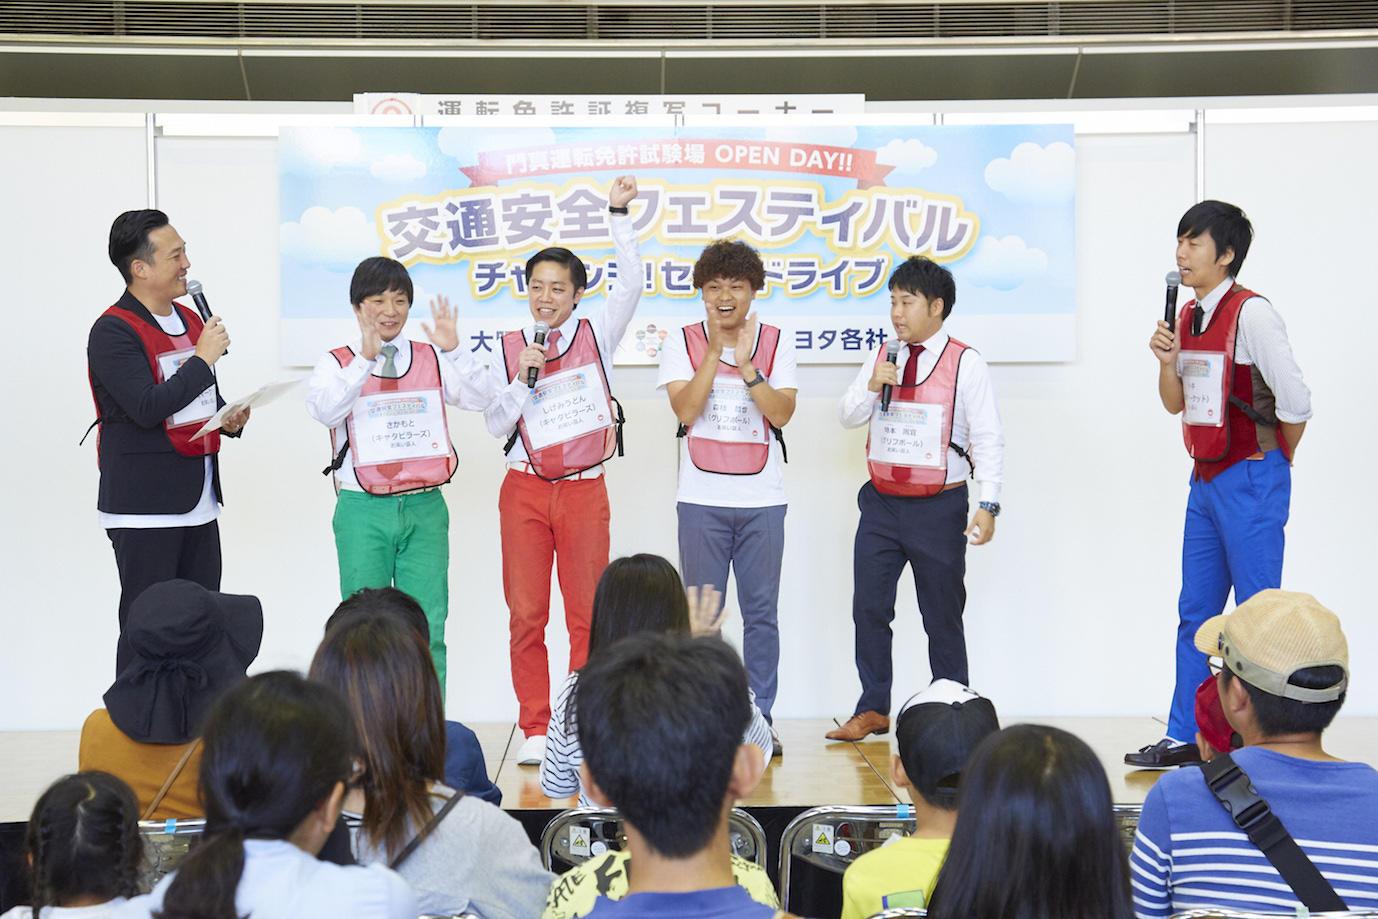 http://news.yoshimoto.co.jp/20181012085850-7085da2b689711aa1669816e5bfd6d4466a1e119.jpg